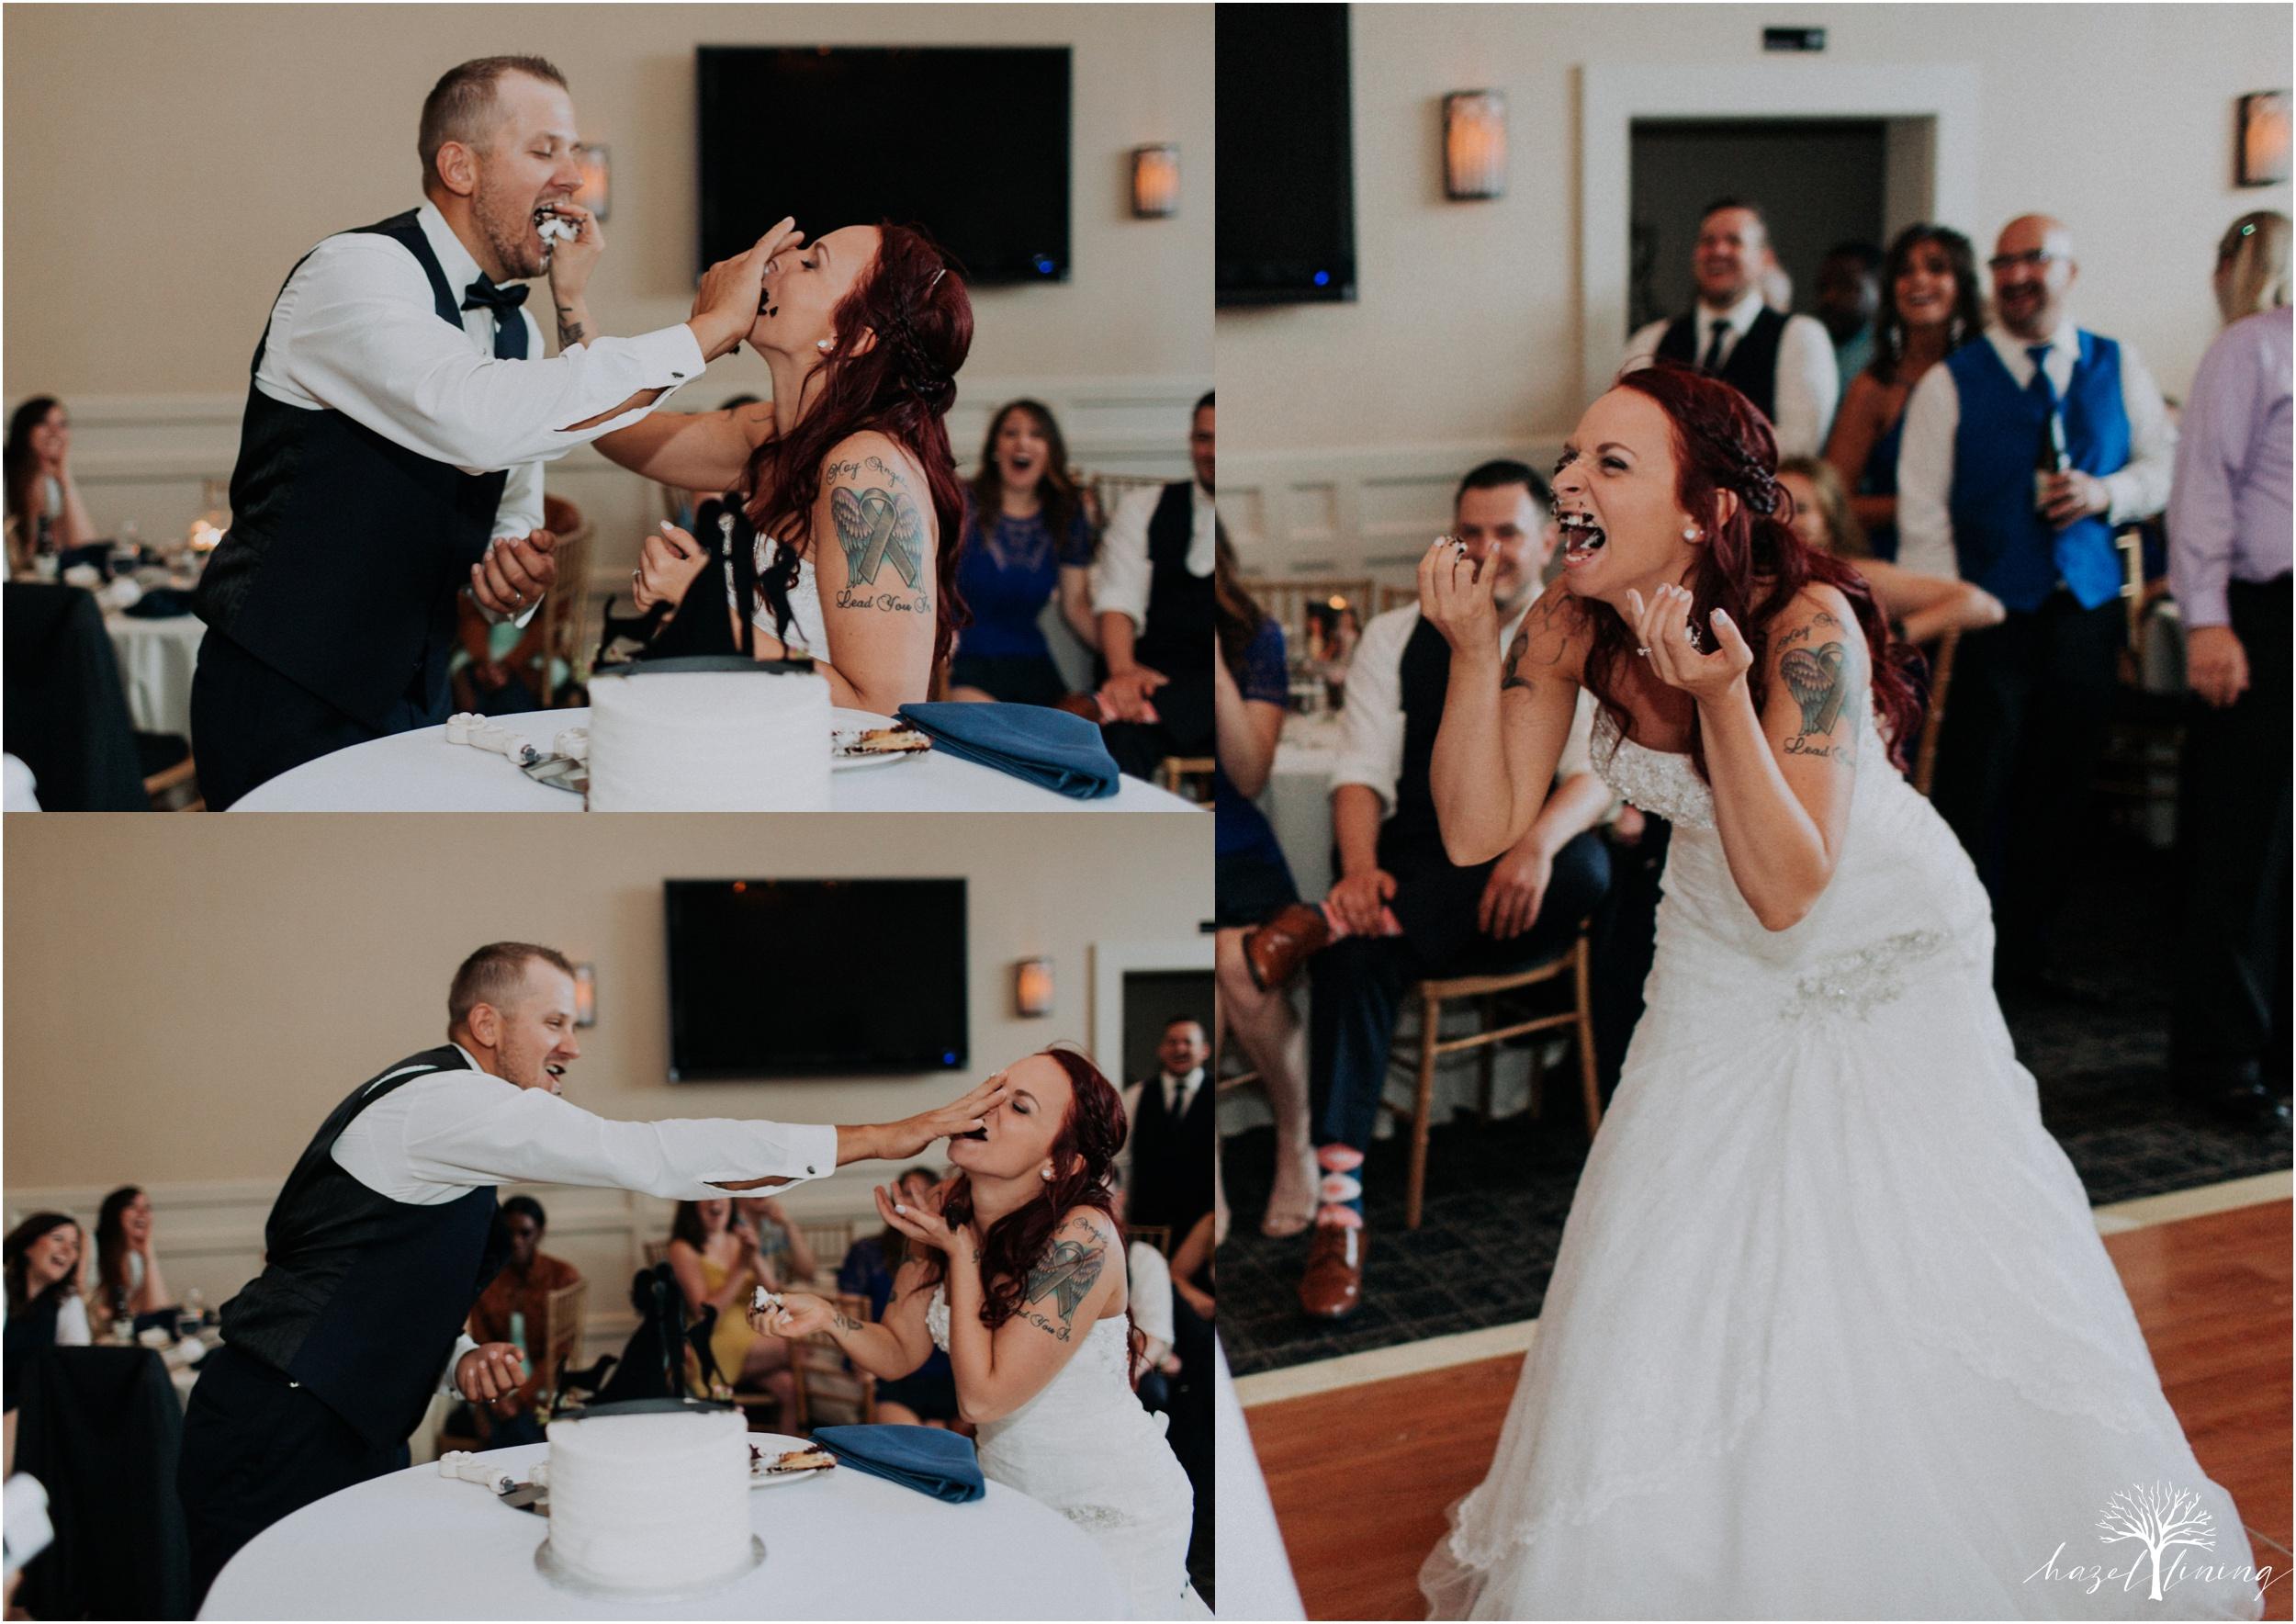 alyssa-james-stiteler-wedding-loft-and-sweet-water-cc-pennsburg-pennsylvania-hazel-lining-travel-wedding-elopement-photography_0145.jpg